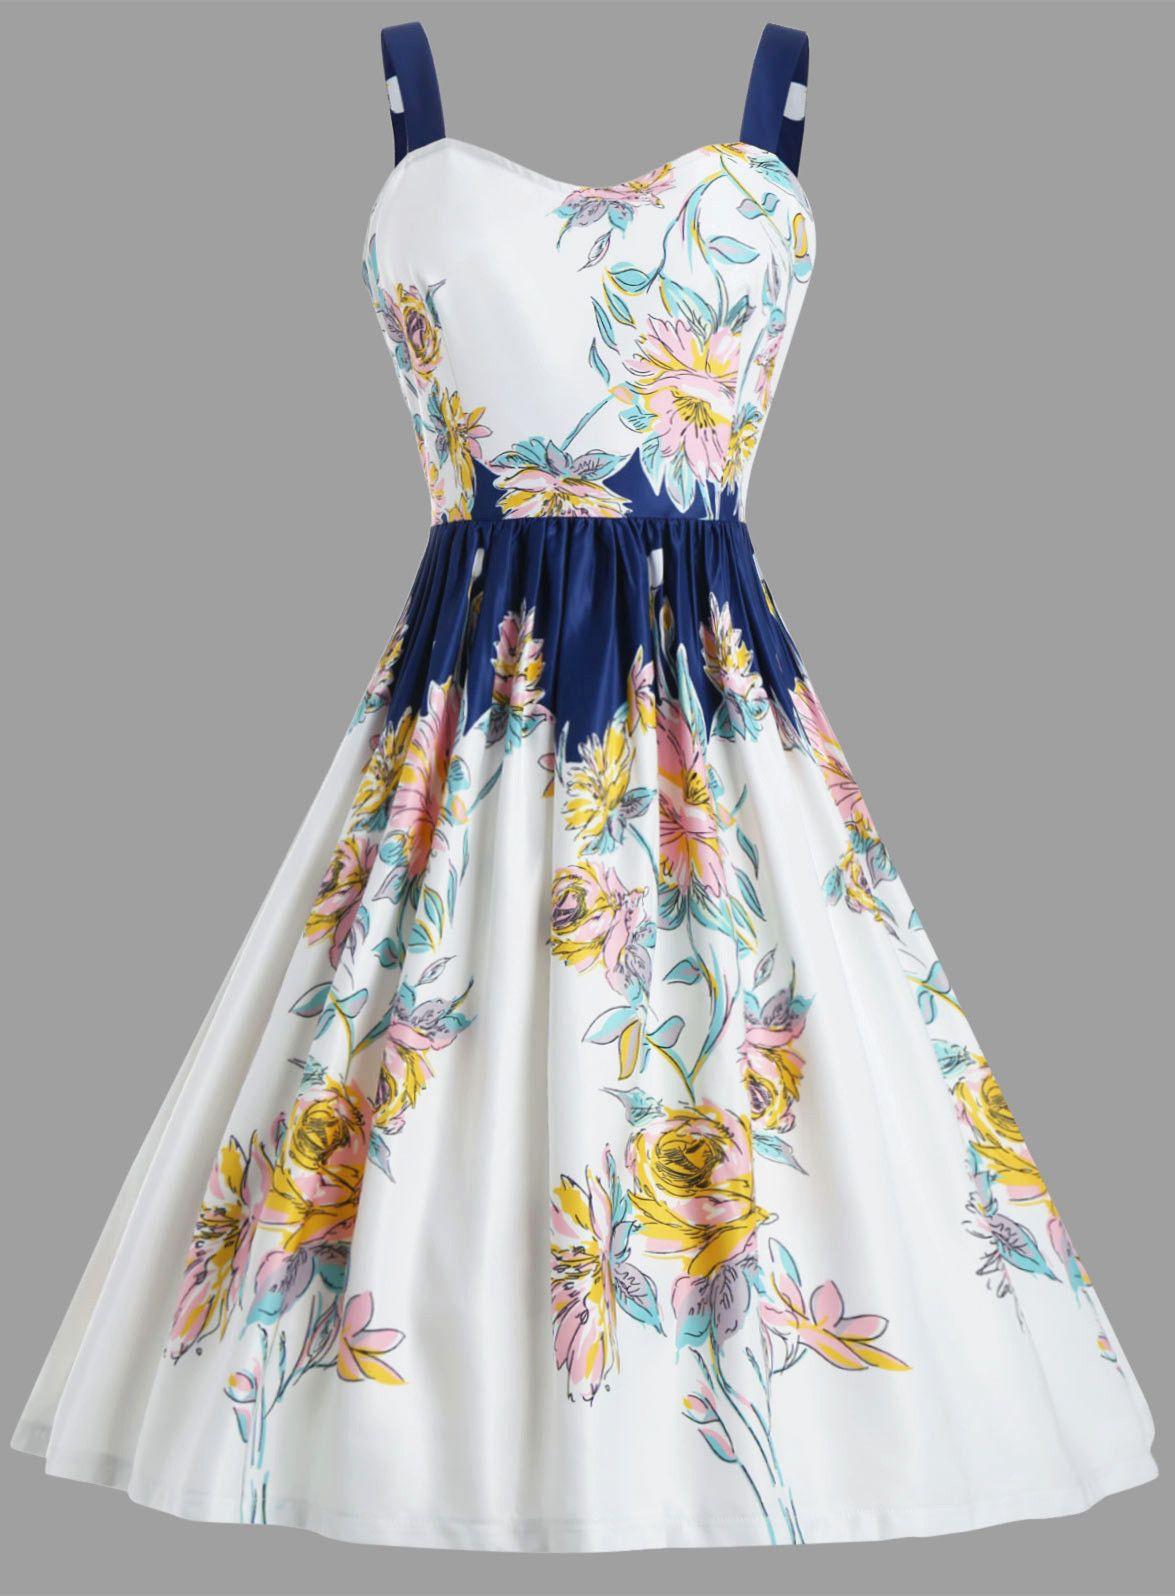 Floral Spaghetic Strap Vintage Party Dress - White - S